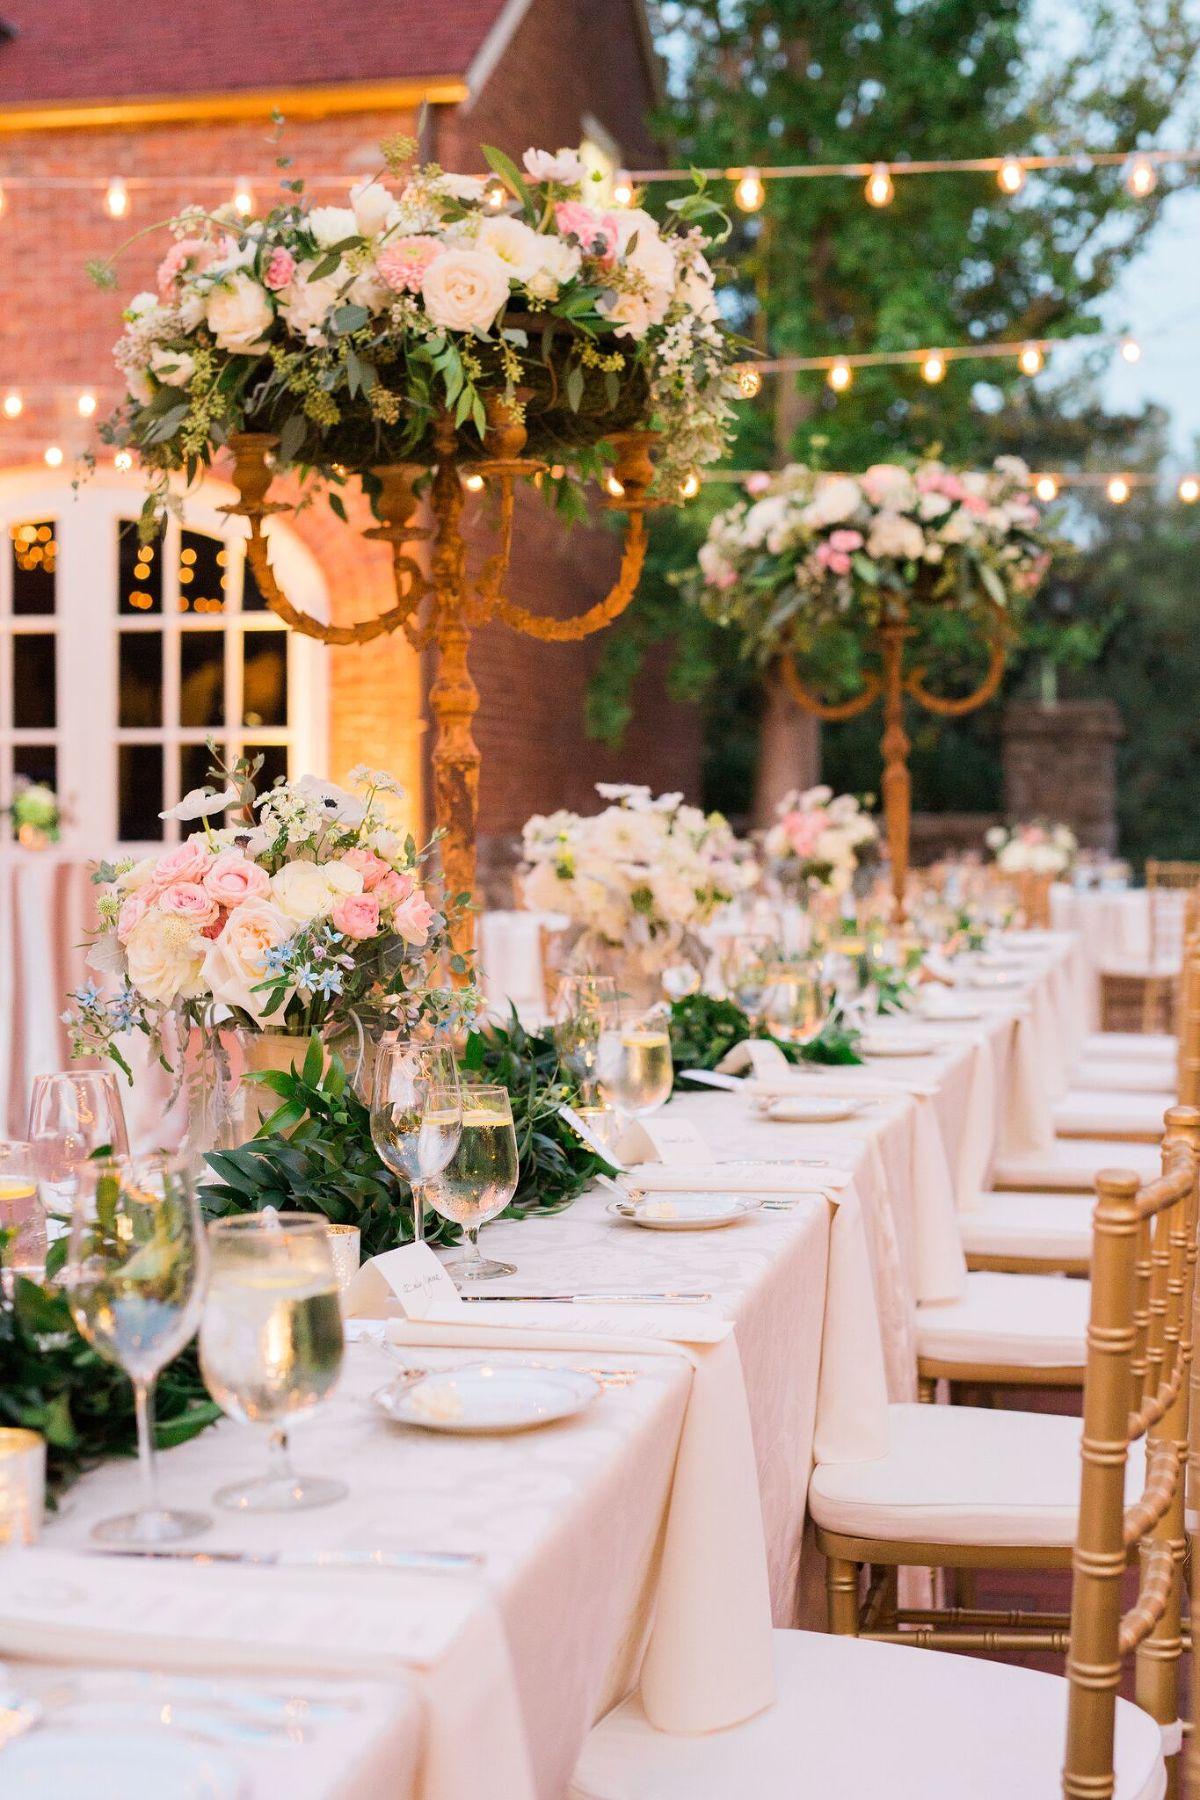 Vision in White Events - Nashville Wedding Planner